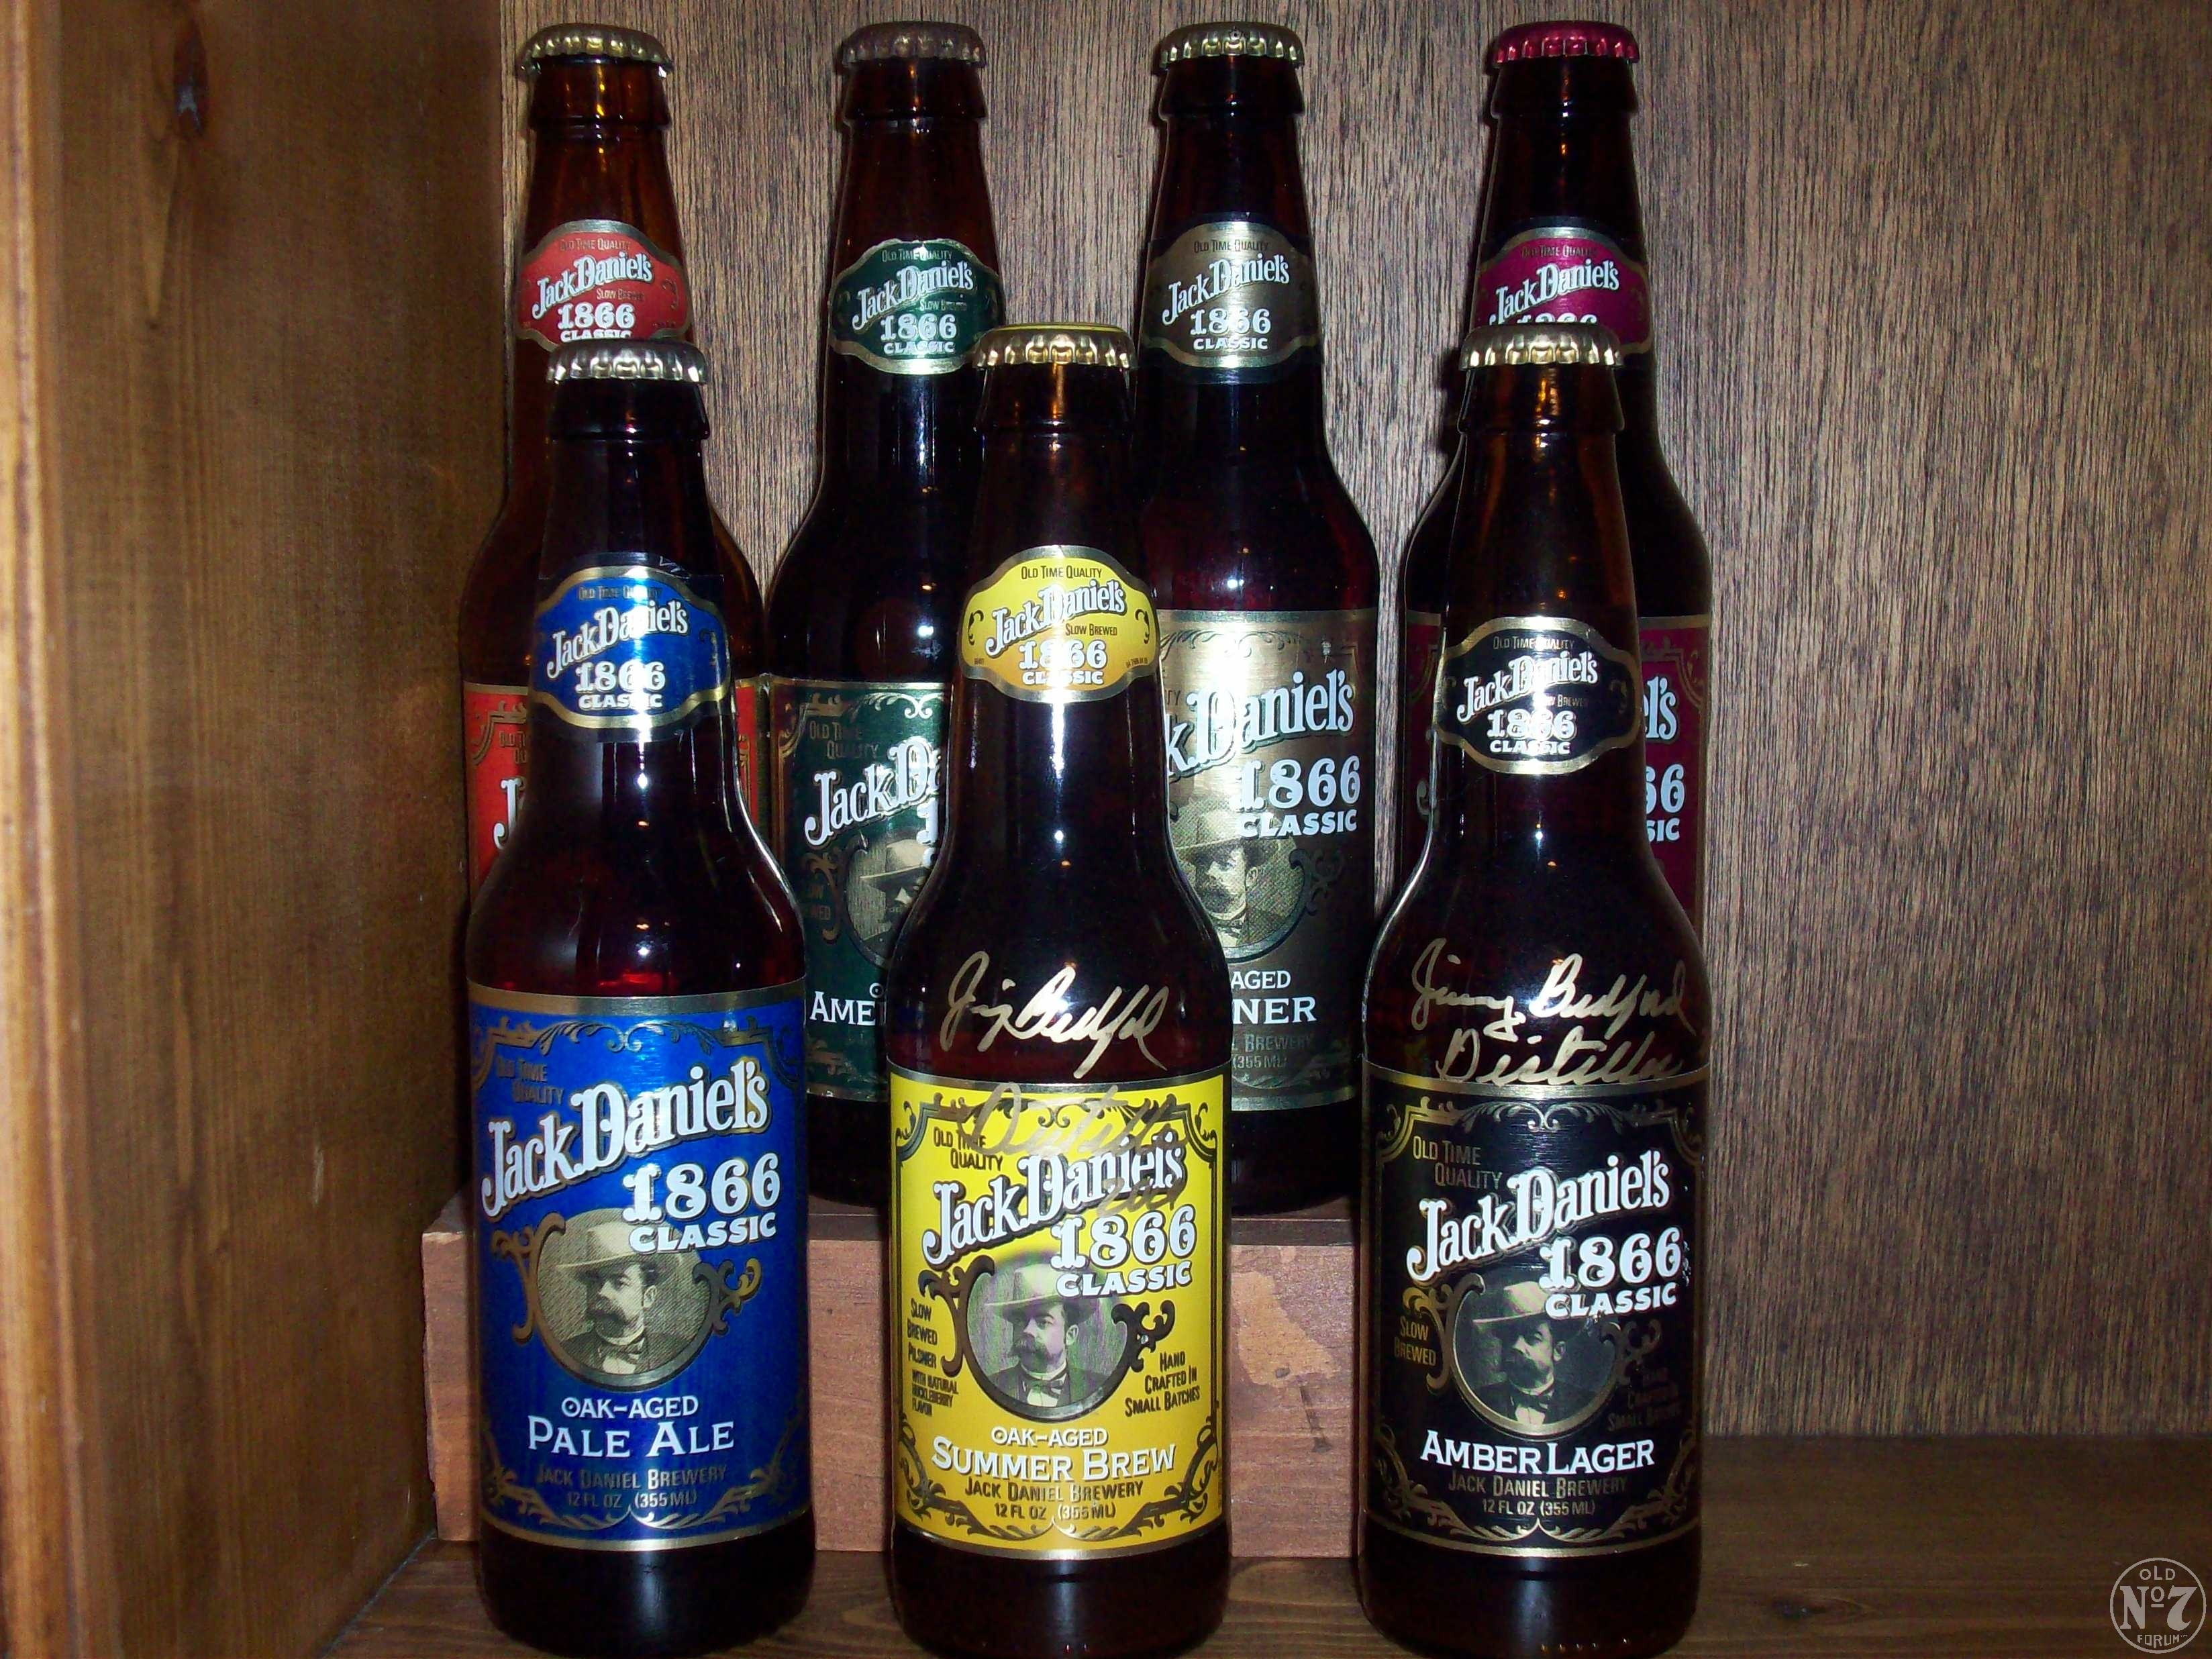 Jack Daniels 1866 Classic Winter Brew Beer Bottle